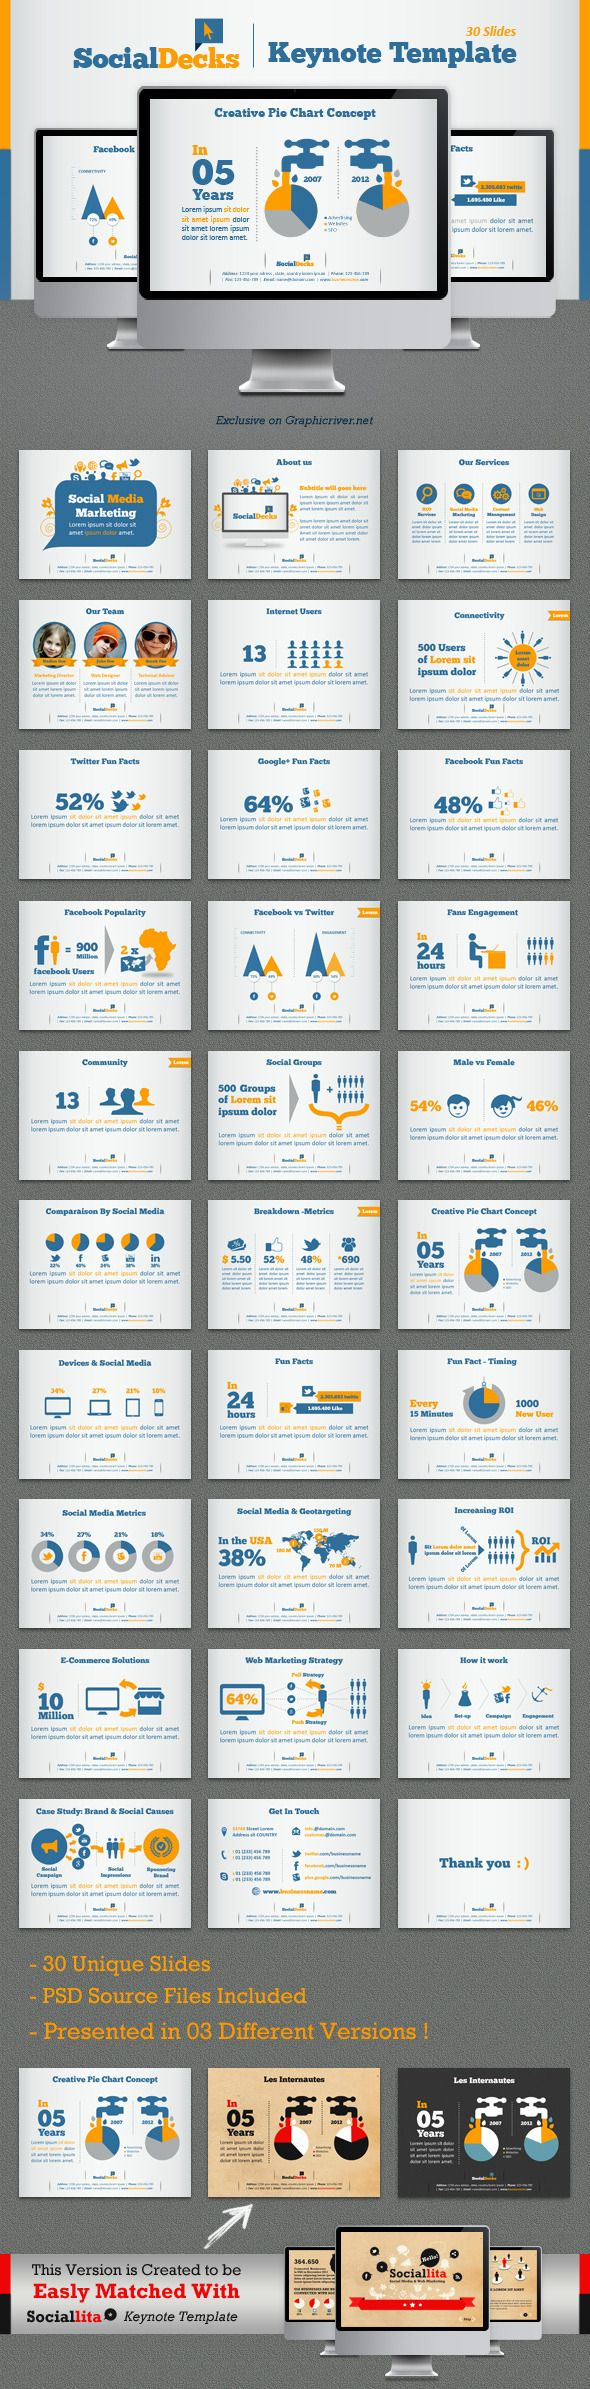 SocialDecks Keynote Template #keynote #keynotetemplate Download: http://graphicriver.net/item/socialdecks-keynote-template/4456737?ref=ksioks